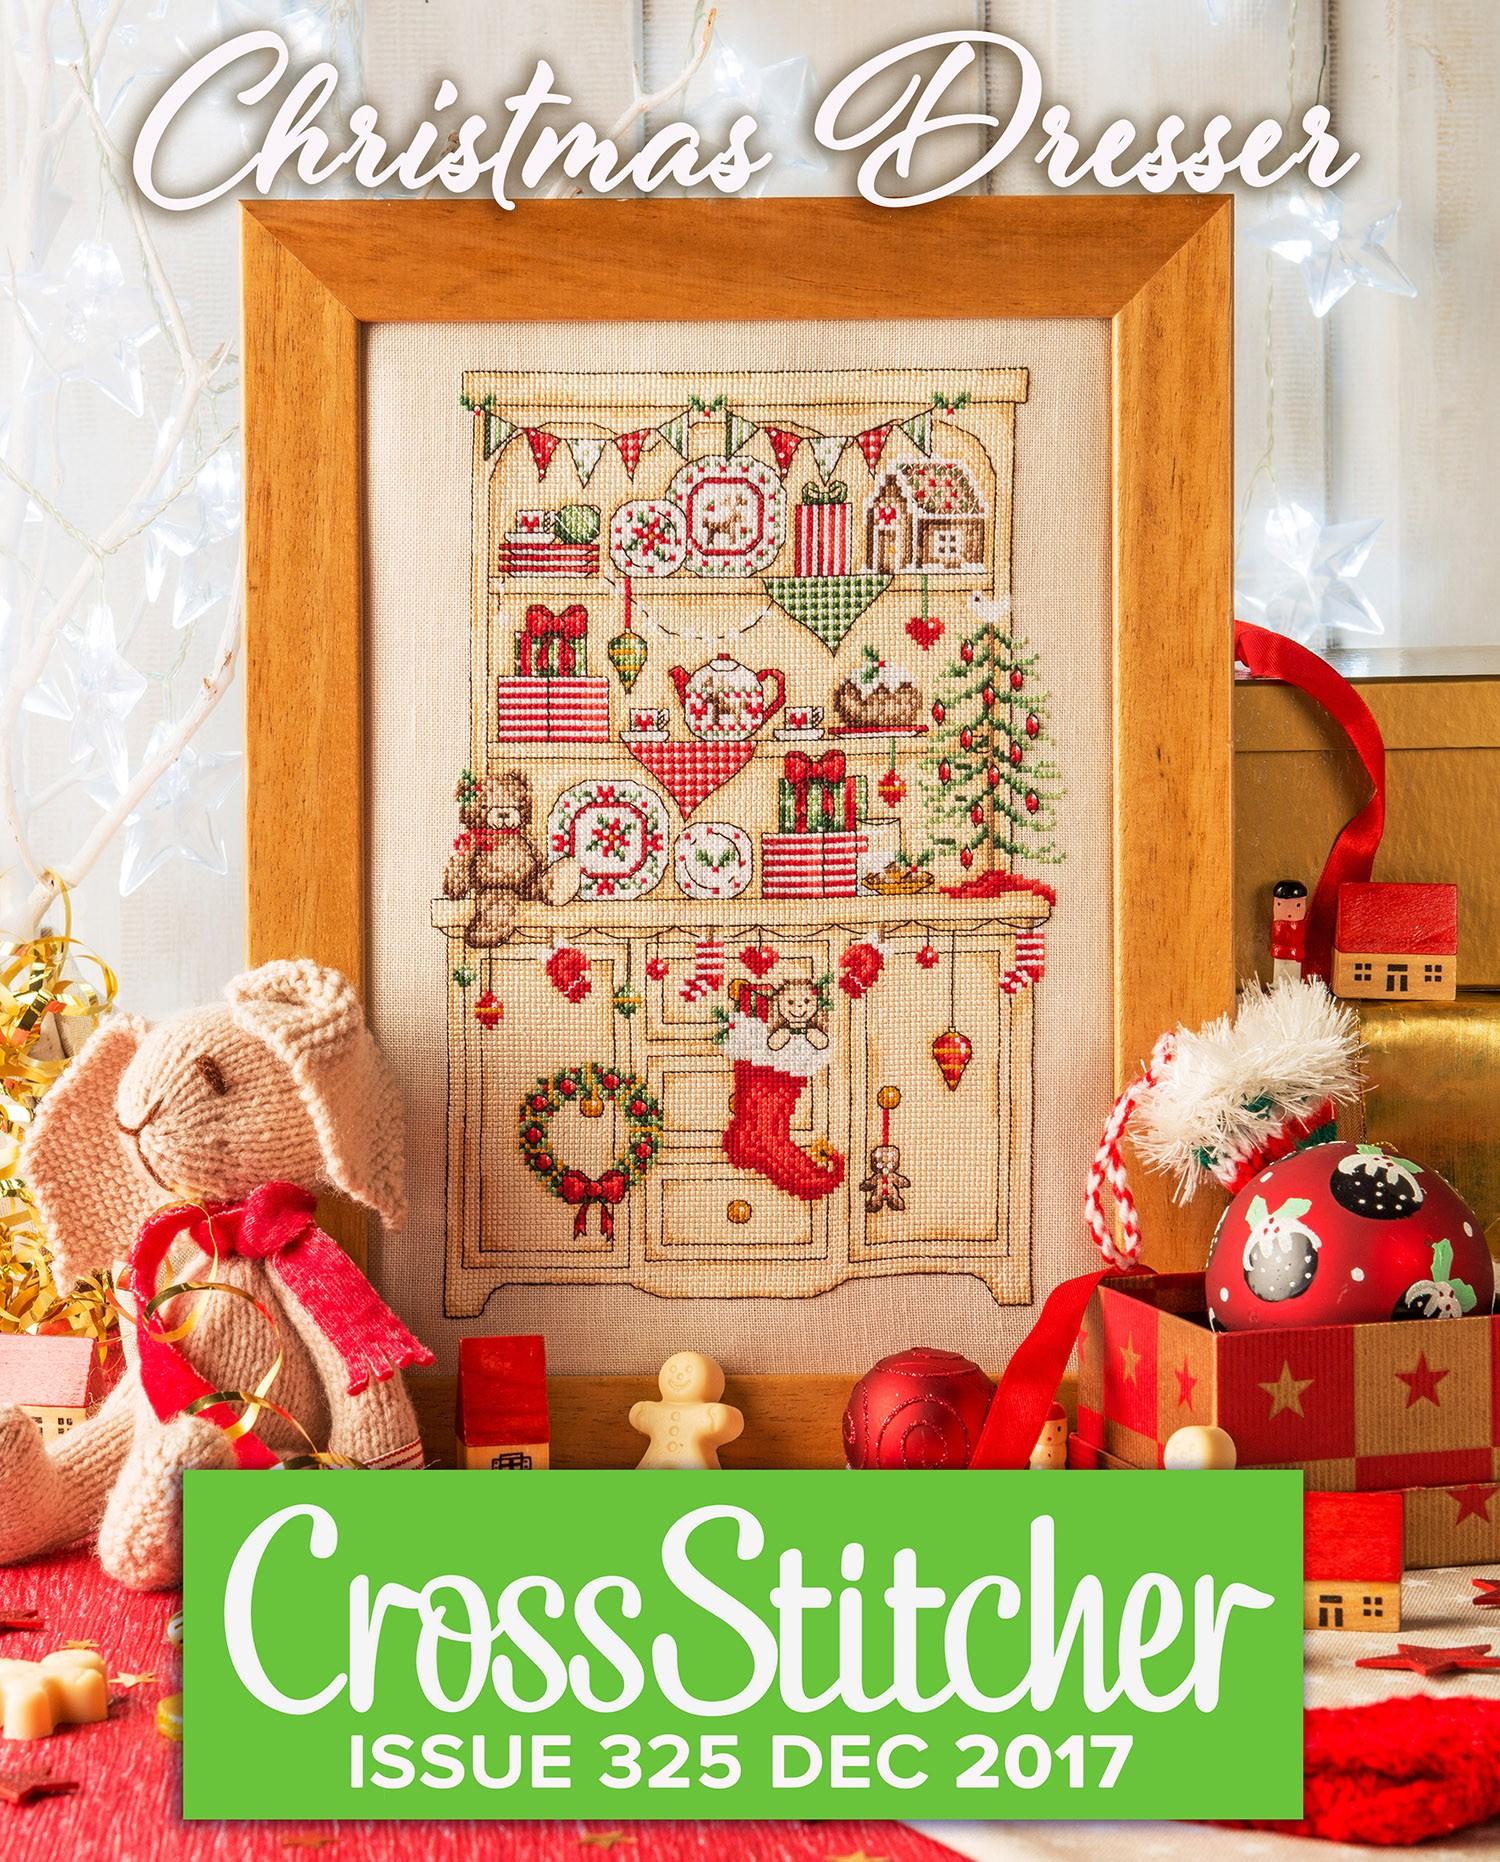 Cross Stitcher Project pack - Christmas Dresser 325